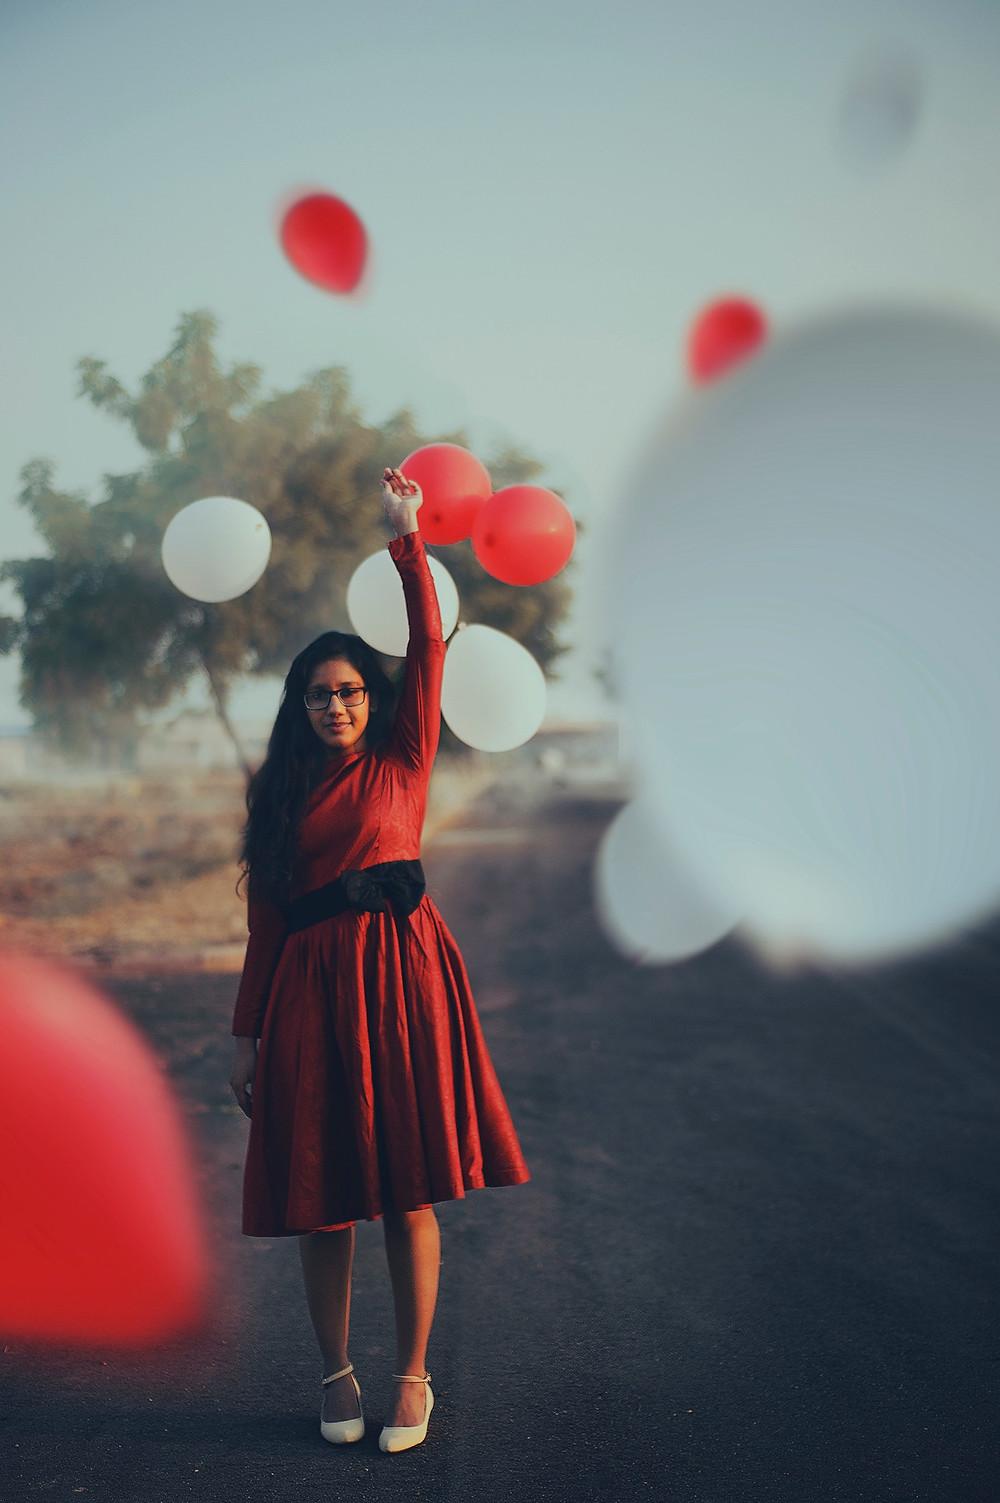 Photo by Cezanne Ali on Unsplash